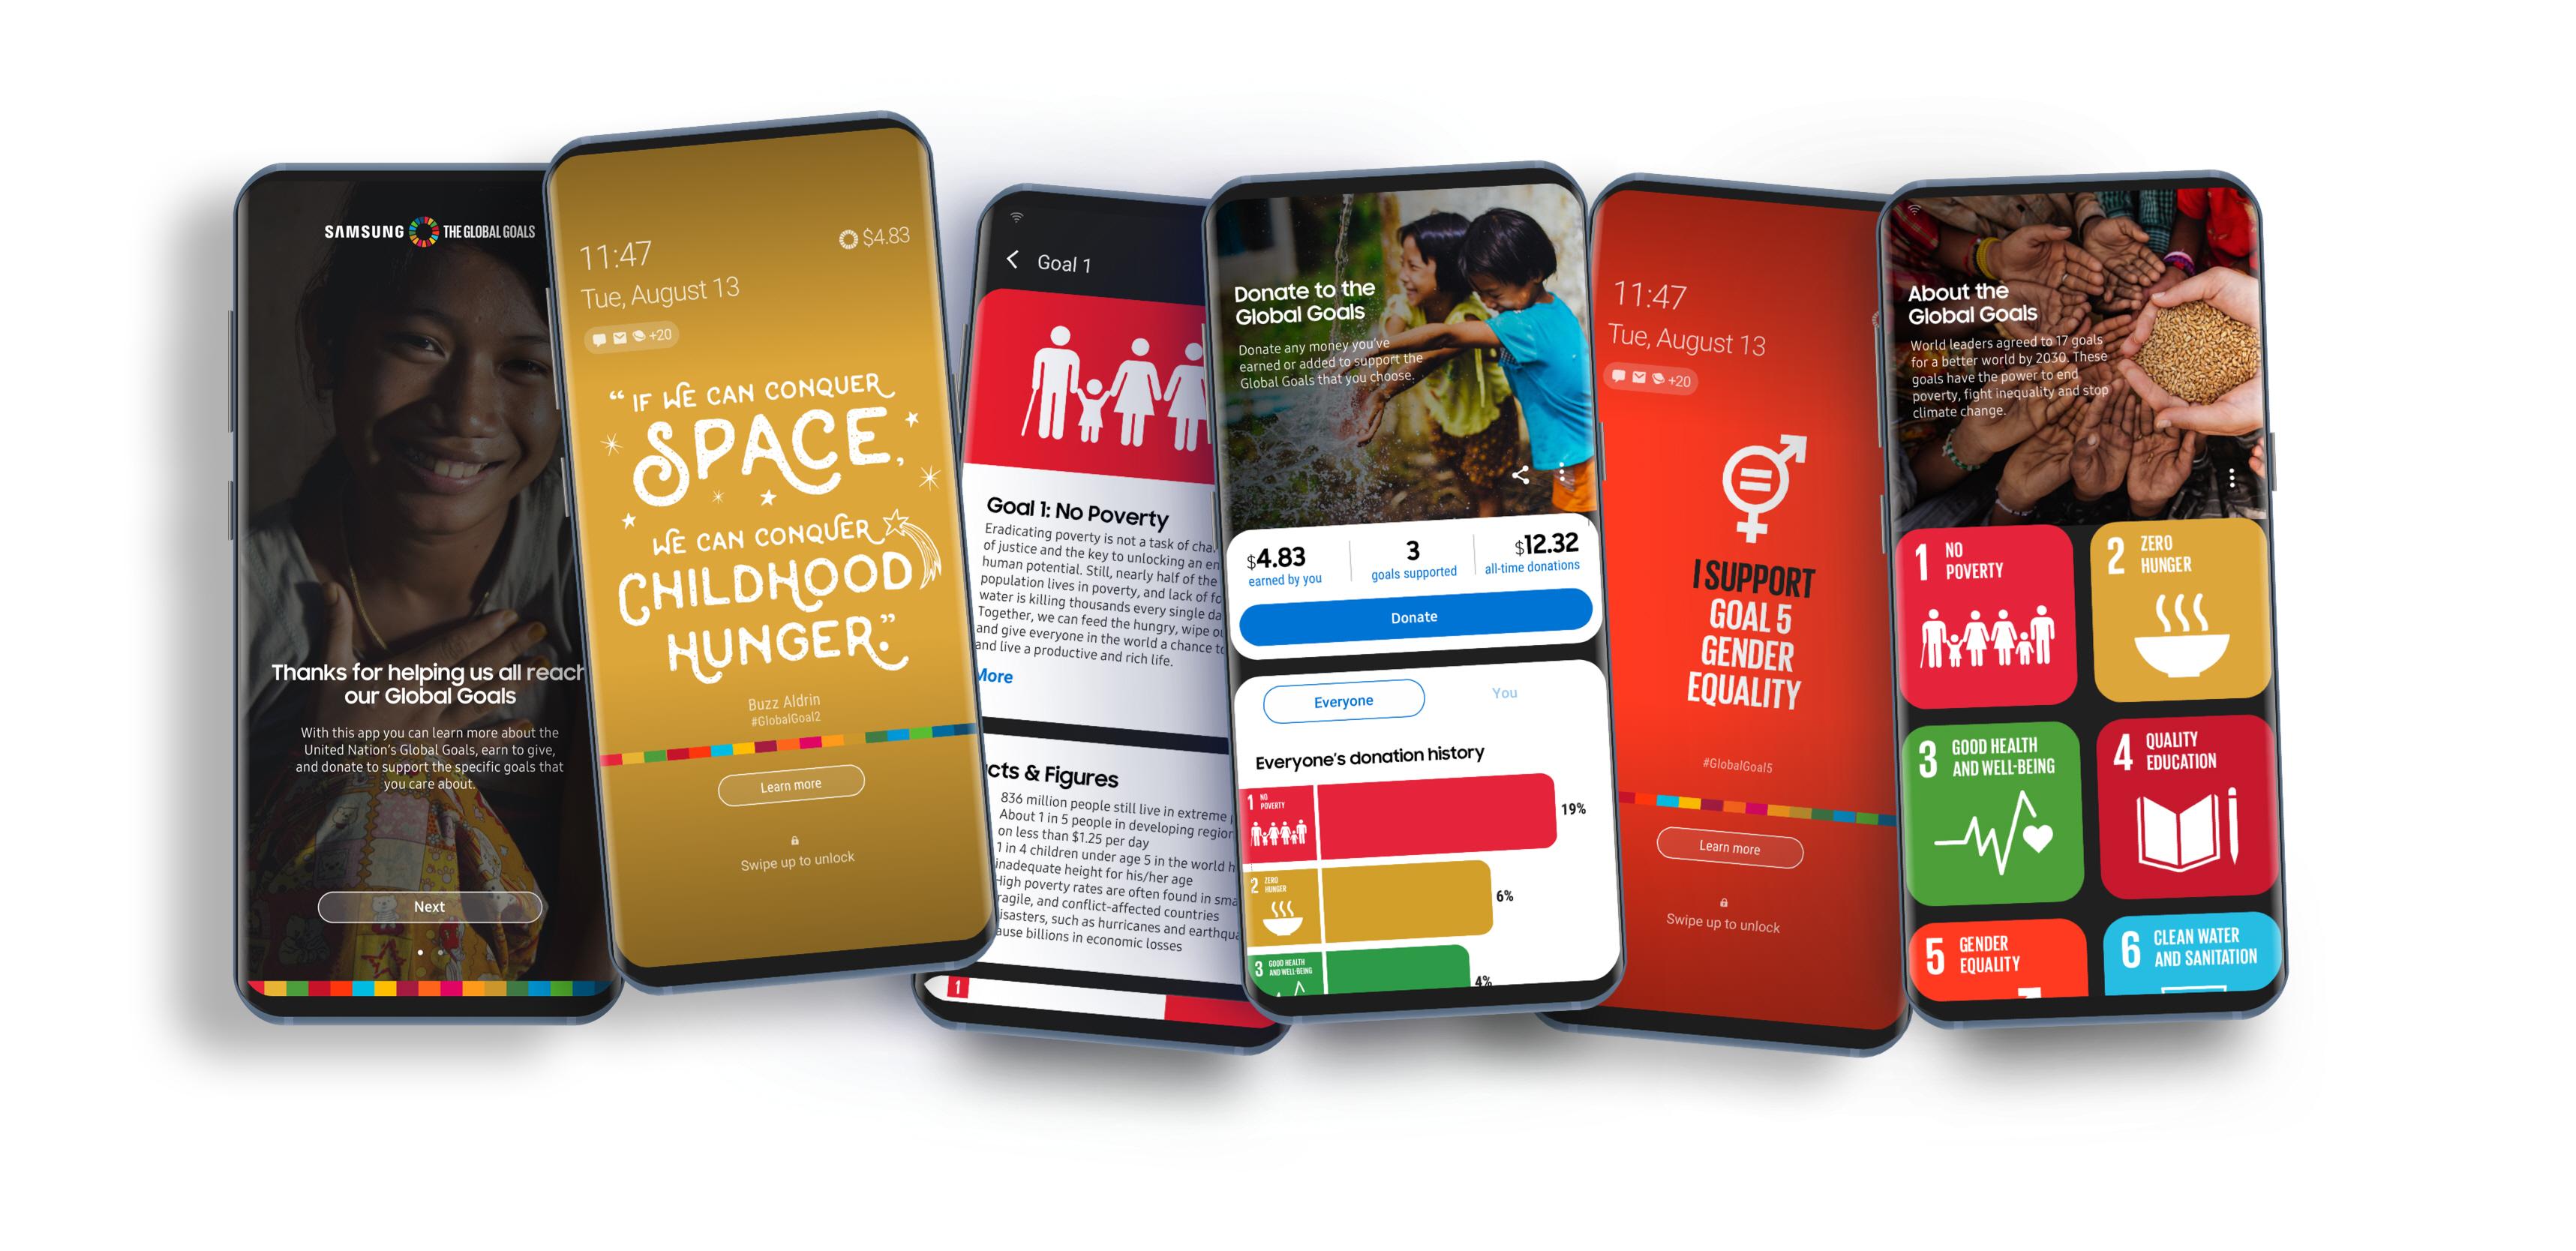 Samsung Global Goals App